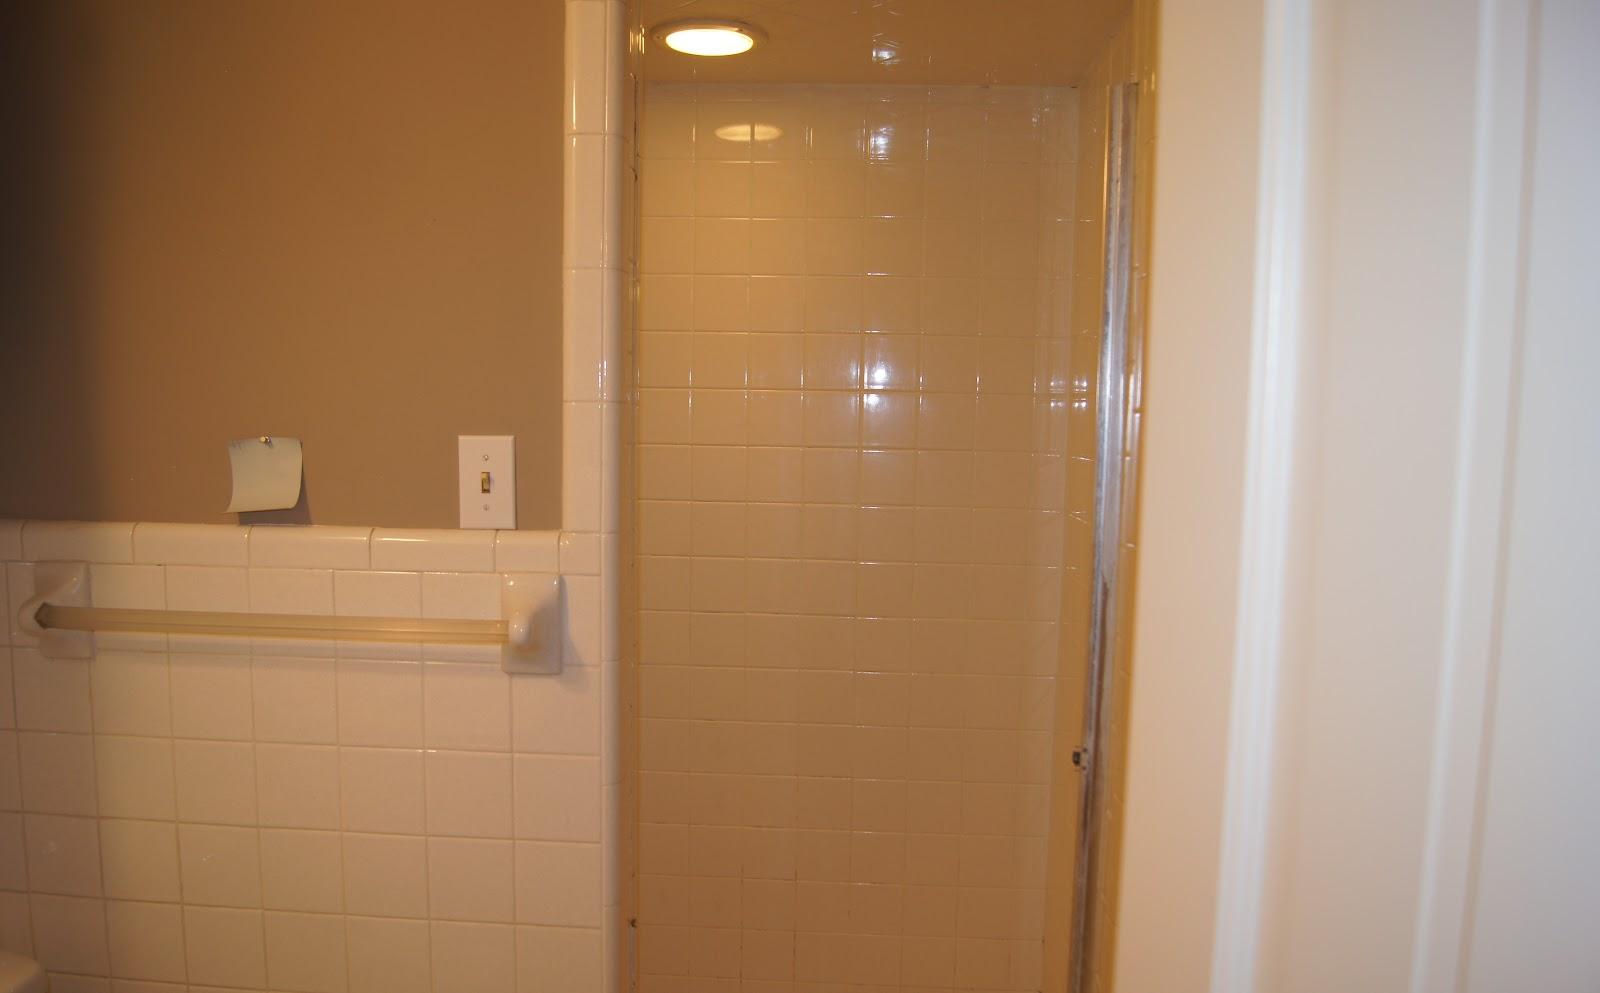 Meaningful home my house tour master bathroom for Megan u bathroom tour